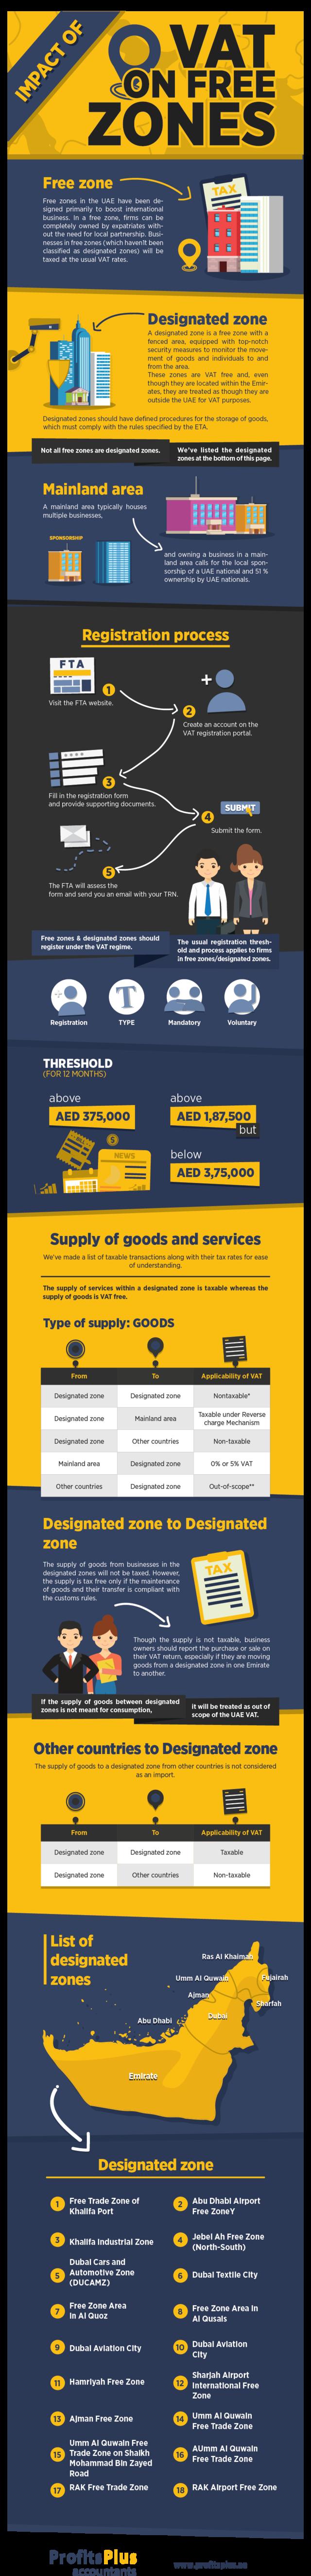 Index 1 infographic